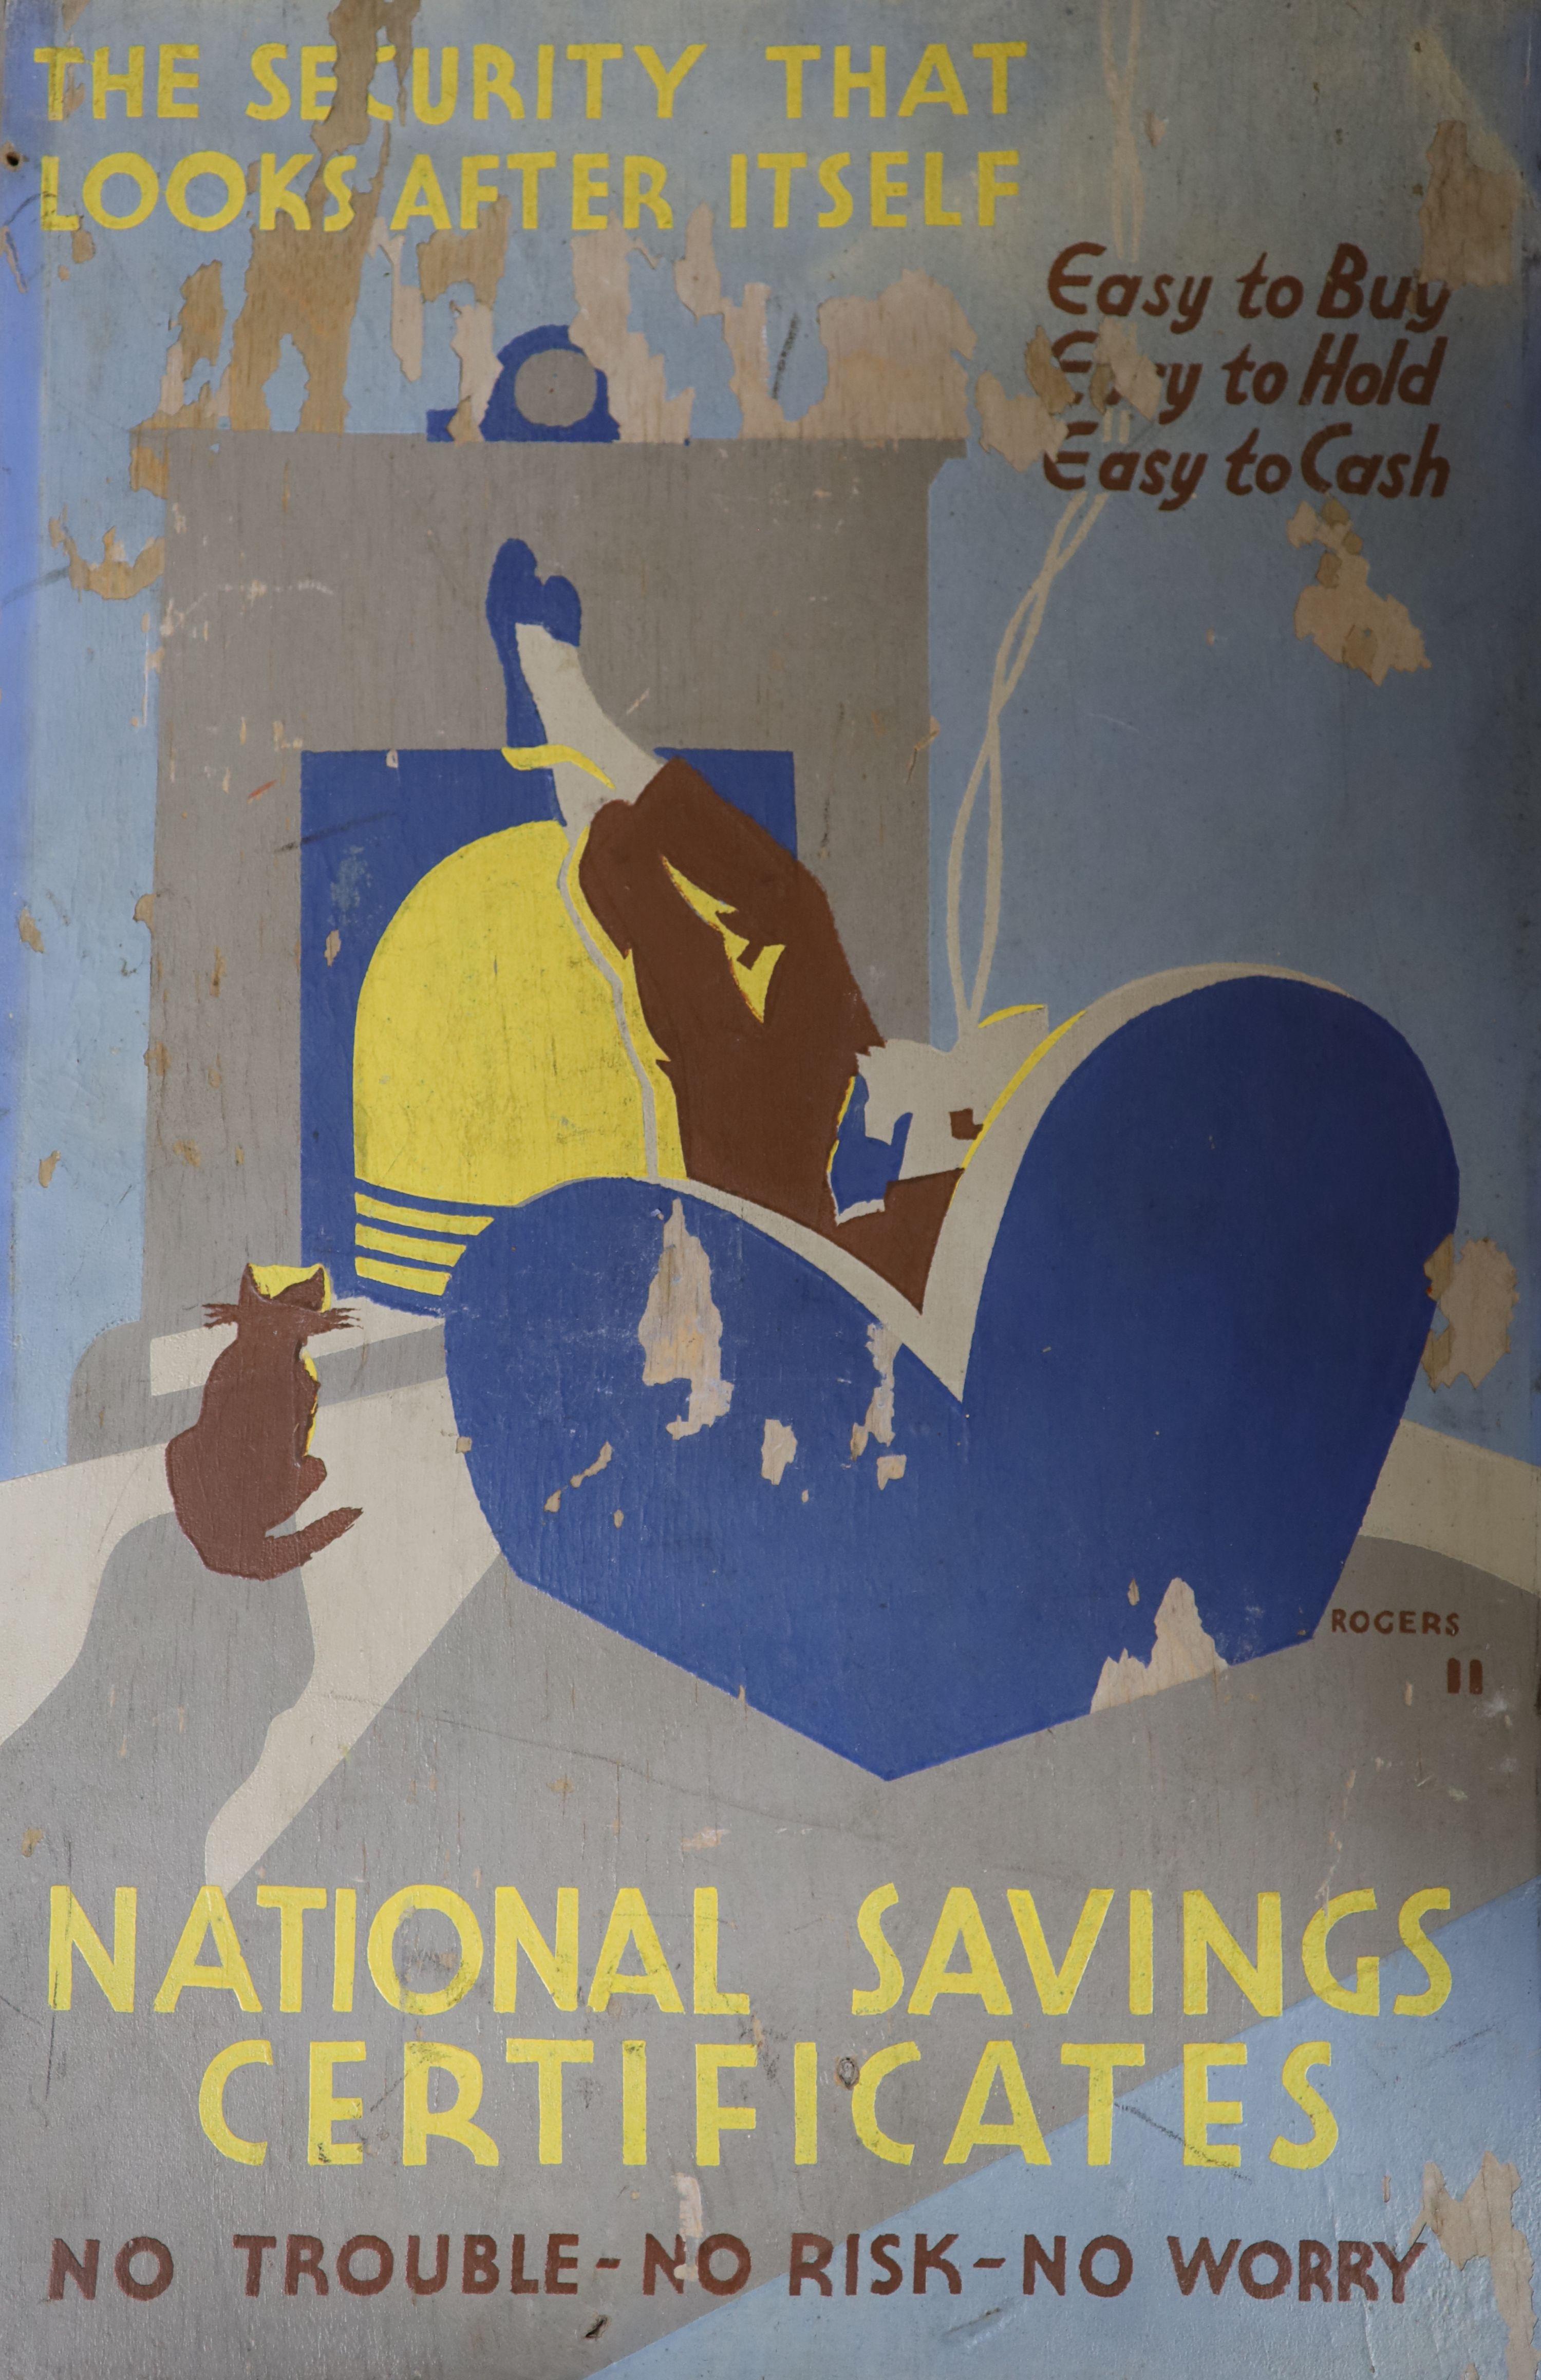 Rogers, oil on wooden panel, original artwork for National Savings Certificates poster, signed, 46